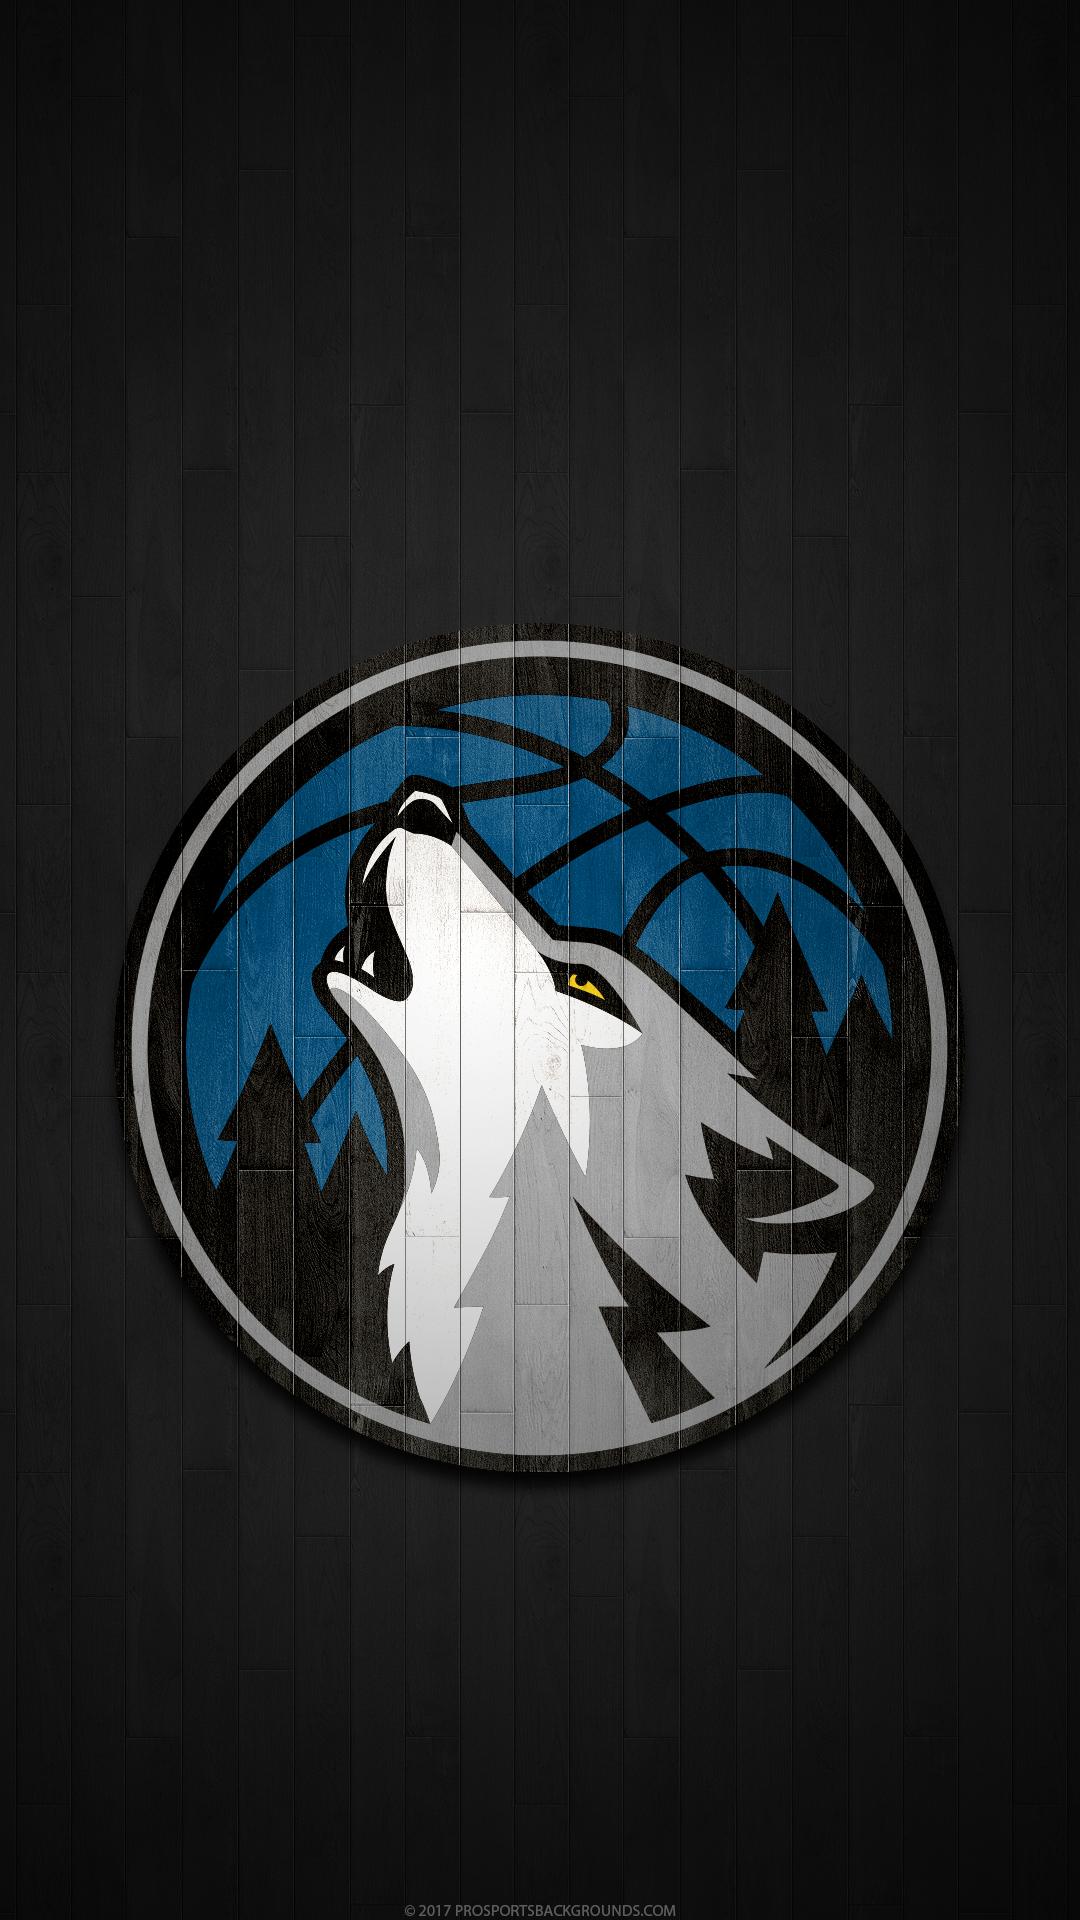 Minnesota Timberwolves 2017 Hardwood Wallpaper Mobile 2 Png 1 080 1 920 Pixels Under Armour Wallpaper Minnesota Timberwolves Nba Wallpapers